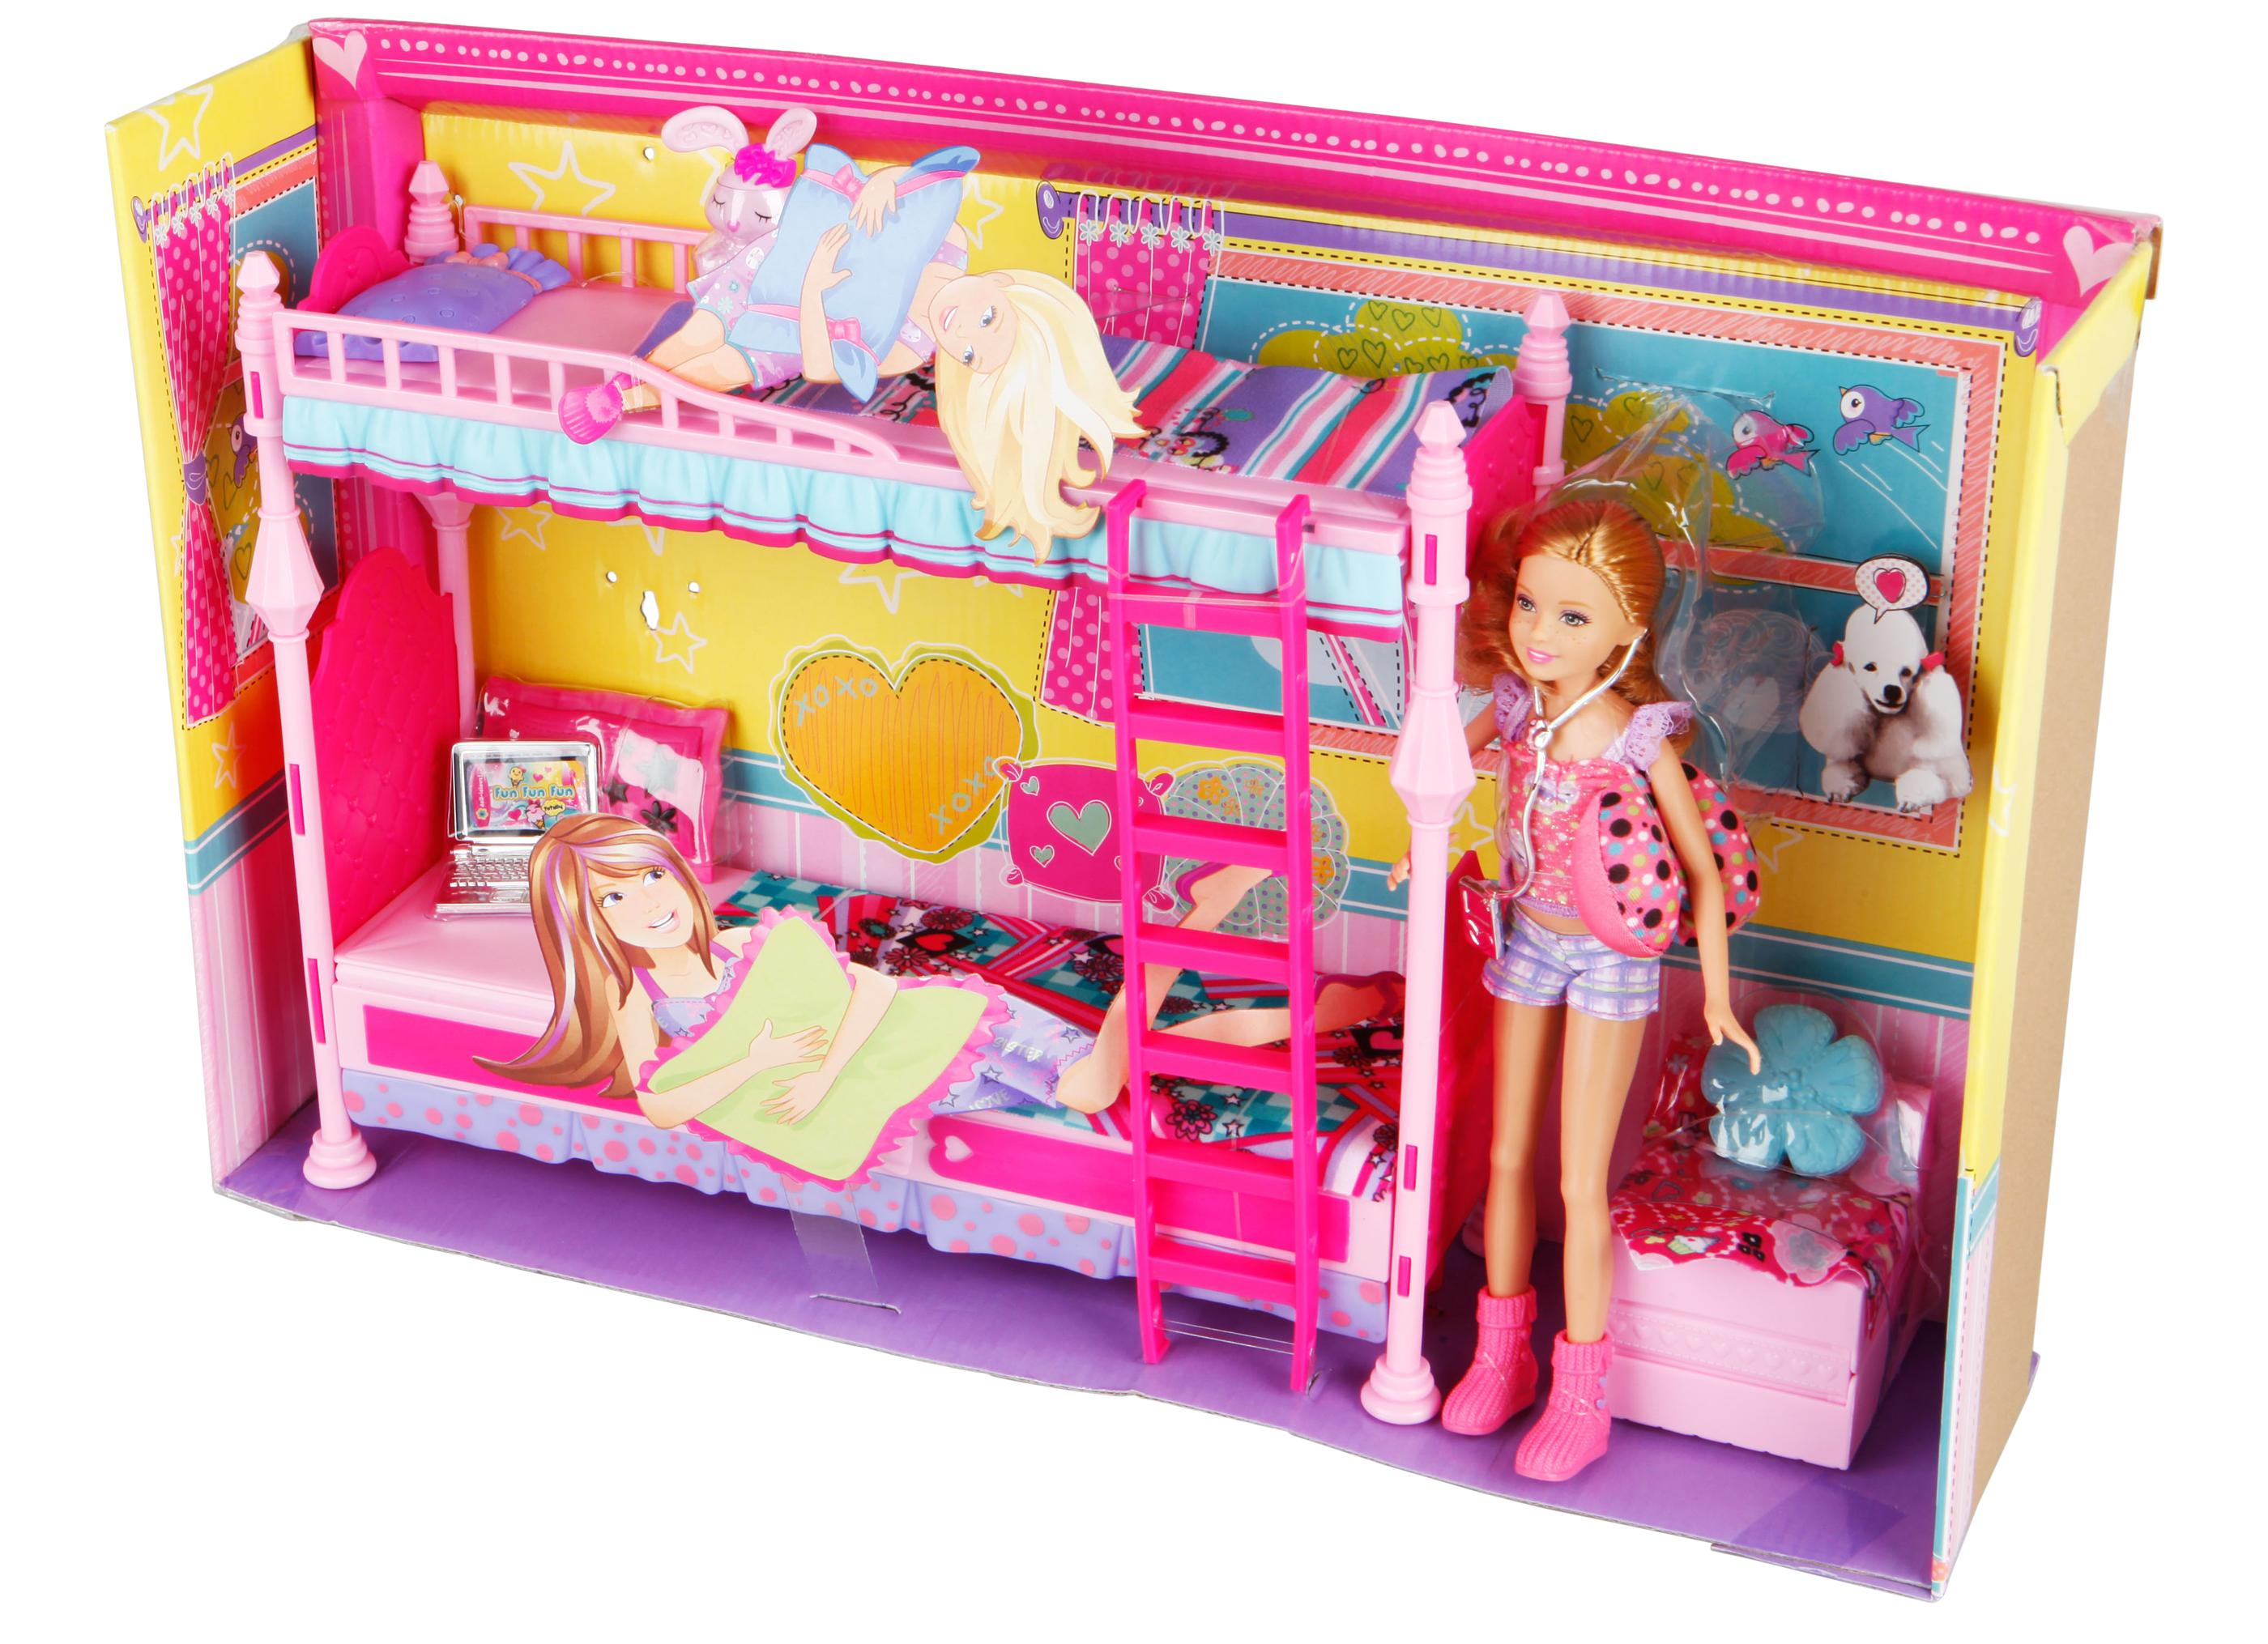 mattel barbie schlafzimmer tapete schlafzimmer edel kommode eiche massiv braun gr n. Black Bedroom Furniture Sets. Home Design Ideas